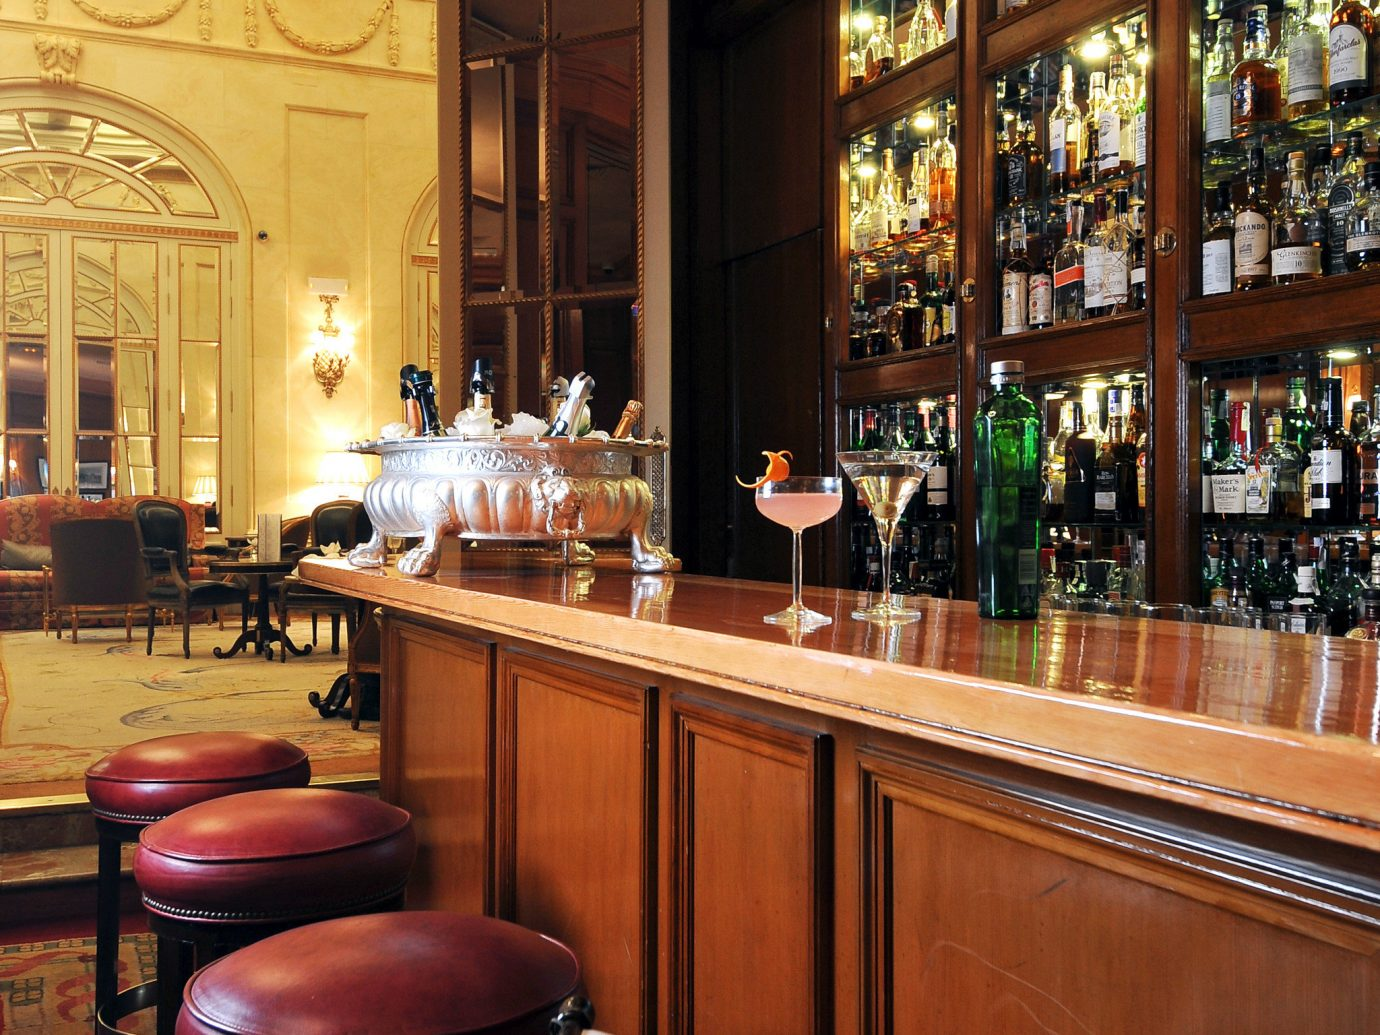 Bar Dining Drink Eat Elegant Historic Hotels Madrid Spain indoor floor ceiling window room restaurant café interior design estate coffeehouse meal area furniture dining room